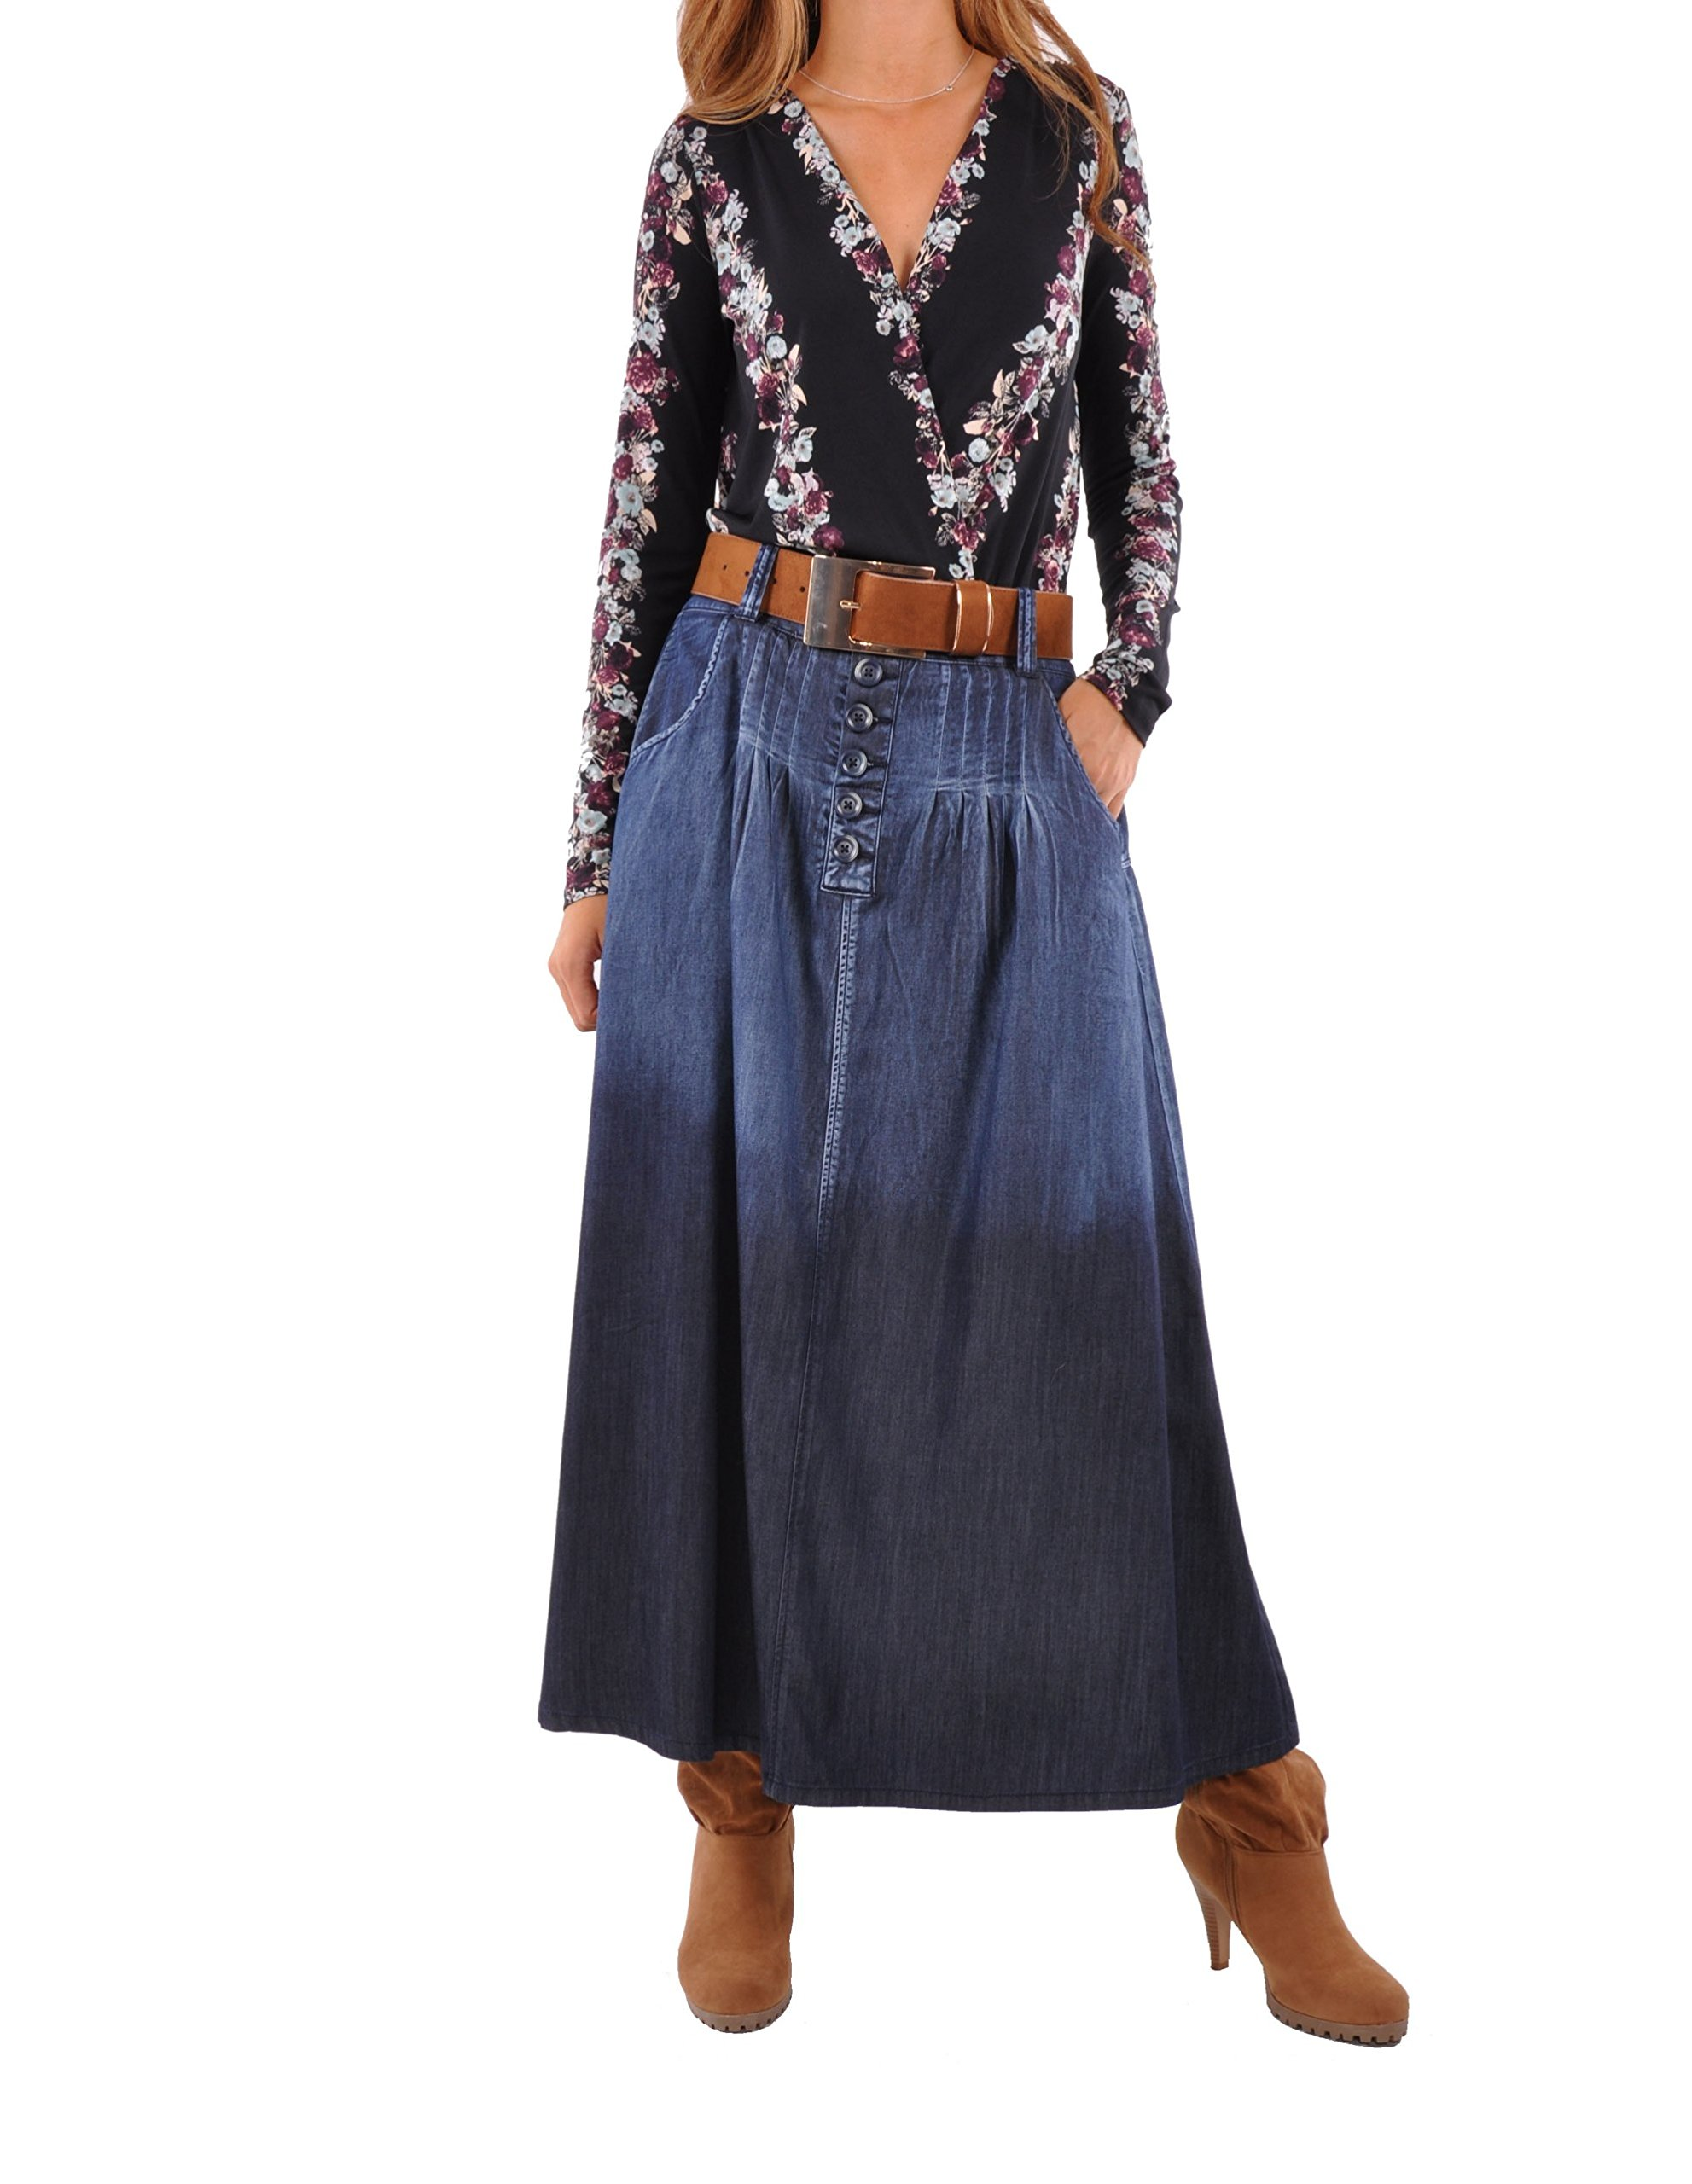 Style J Chambray Chic Denim Skirt-Blue-30(10)